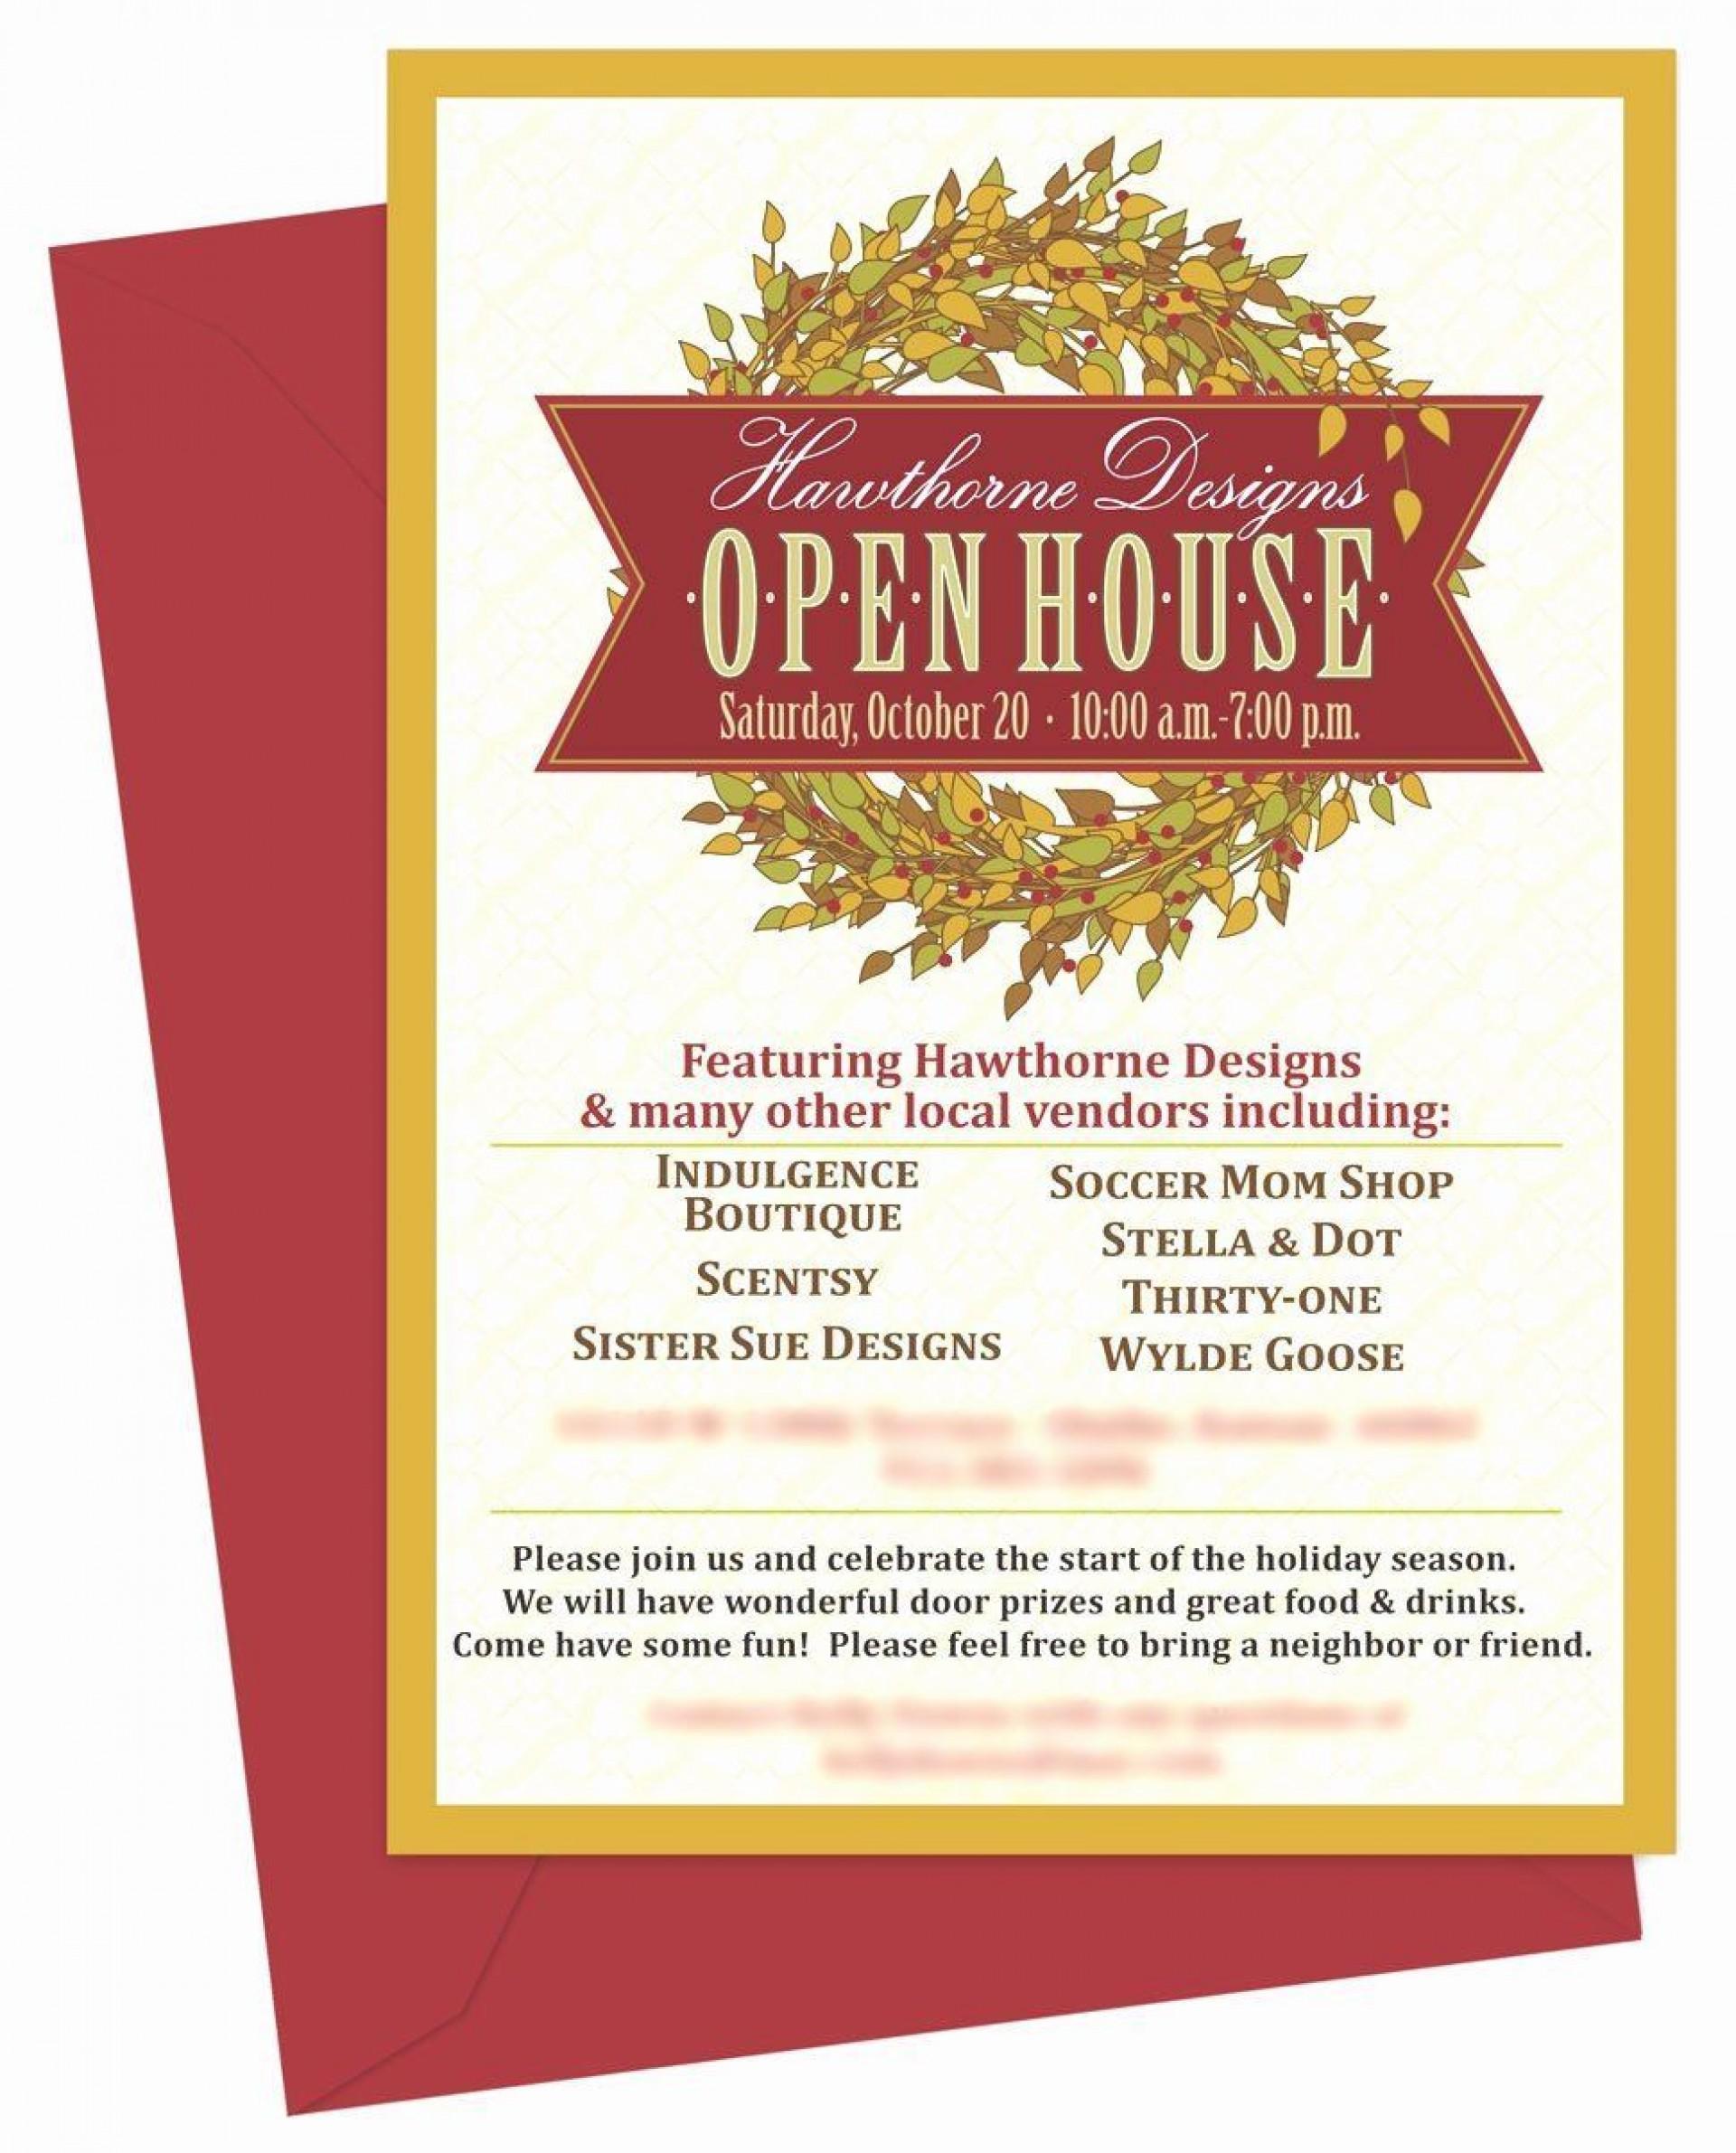 000 Sensational Open House Invitation Template Concept  Templates Free Printable Busines1920